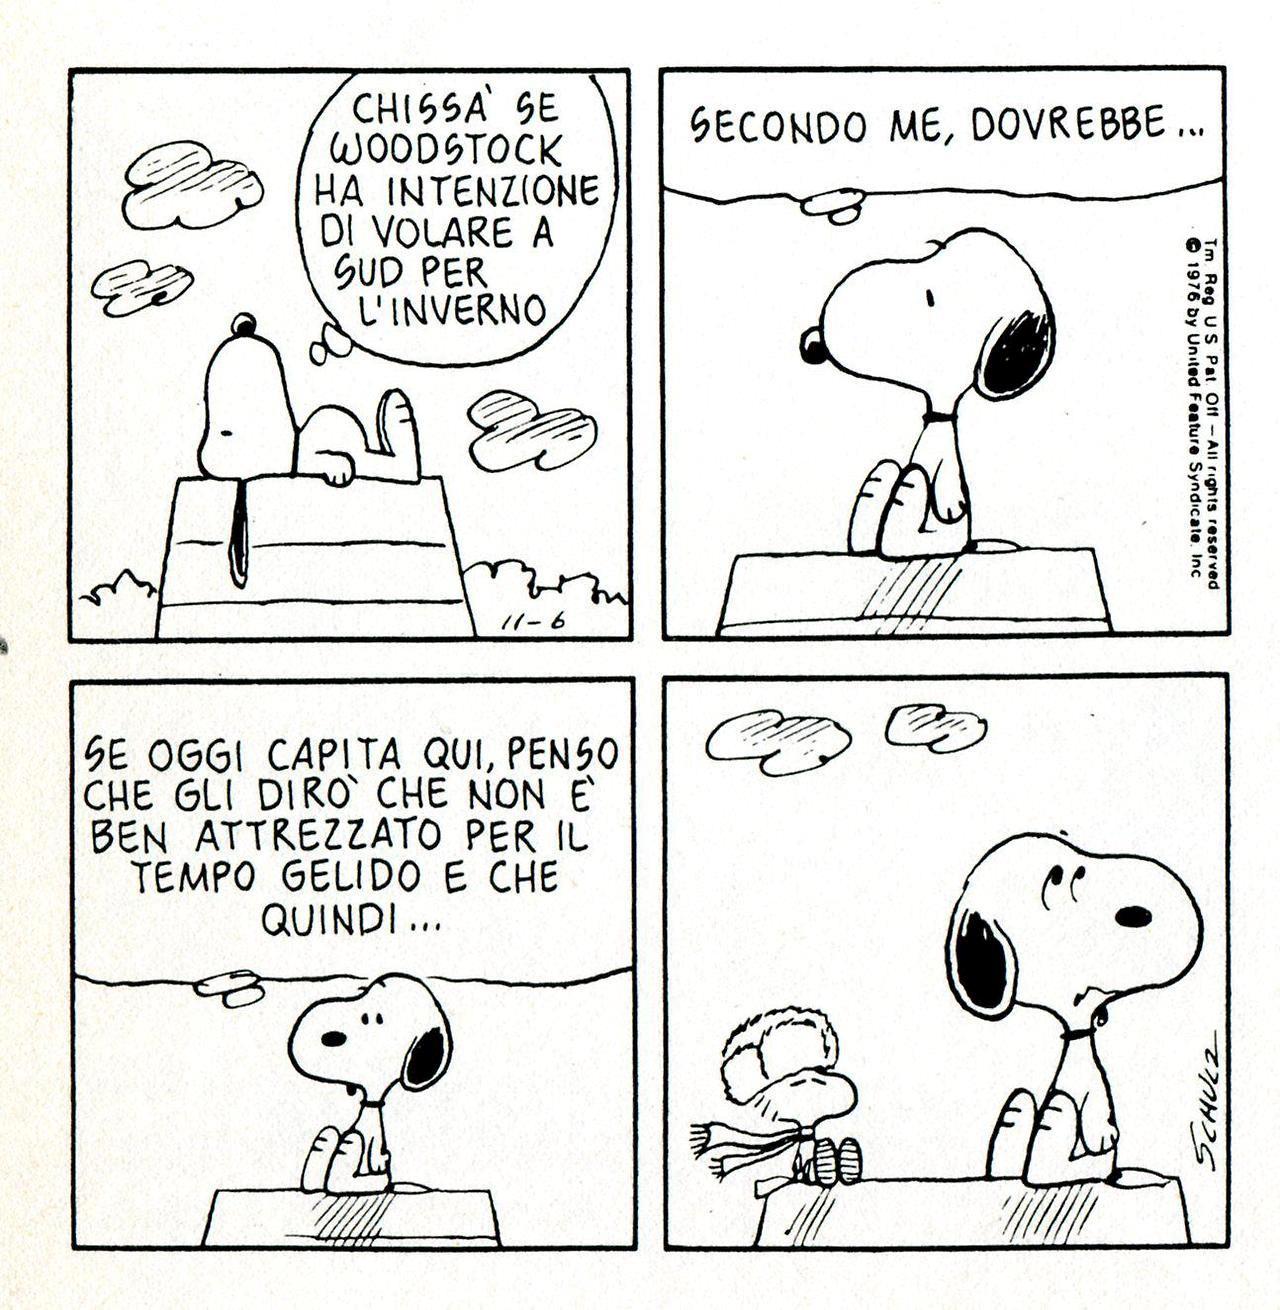 Snoopy Freddo Powermall